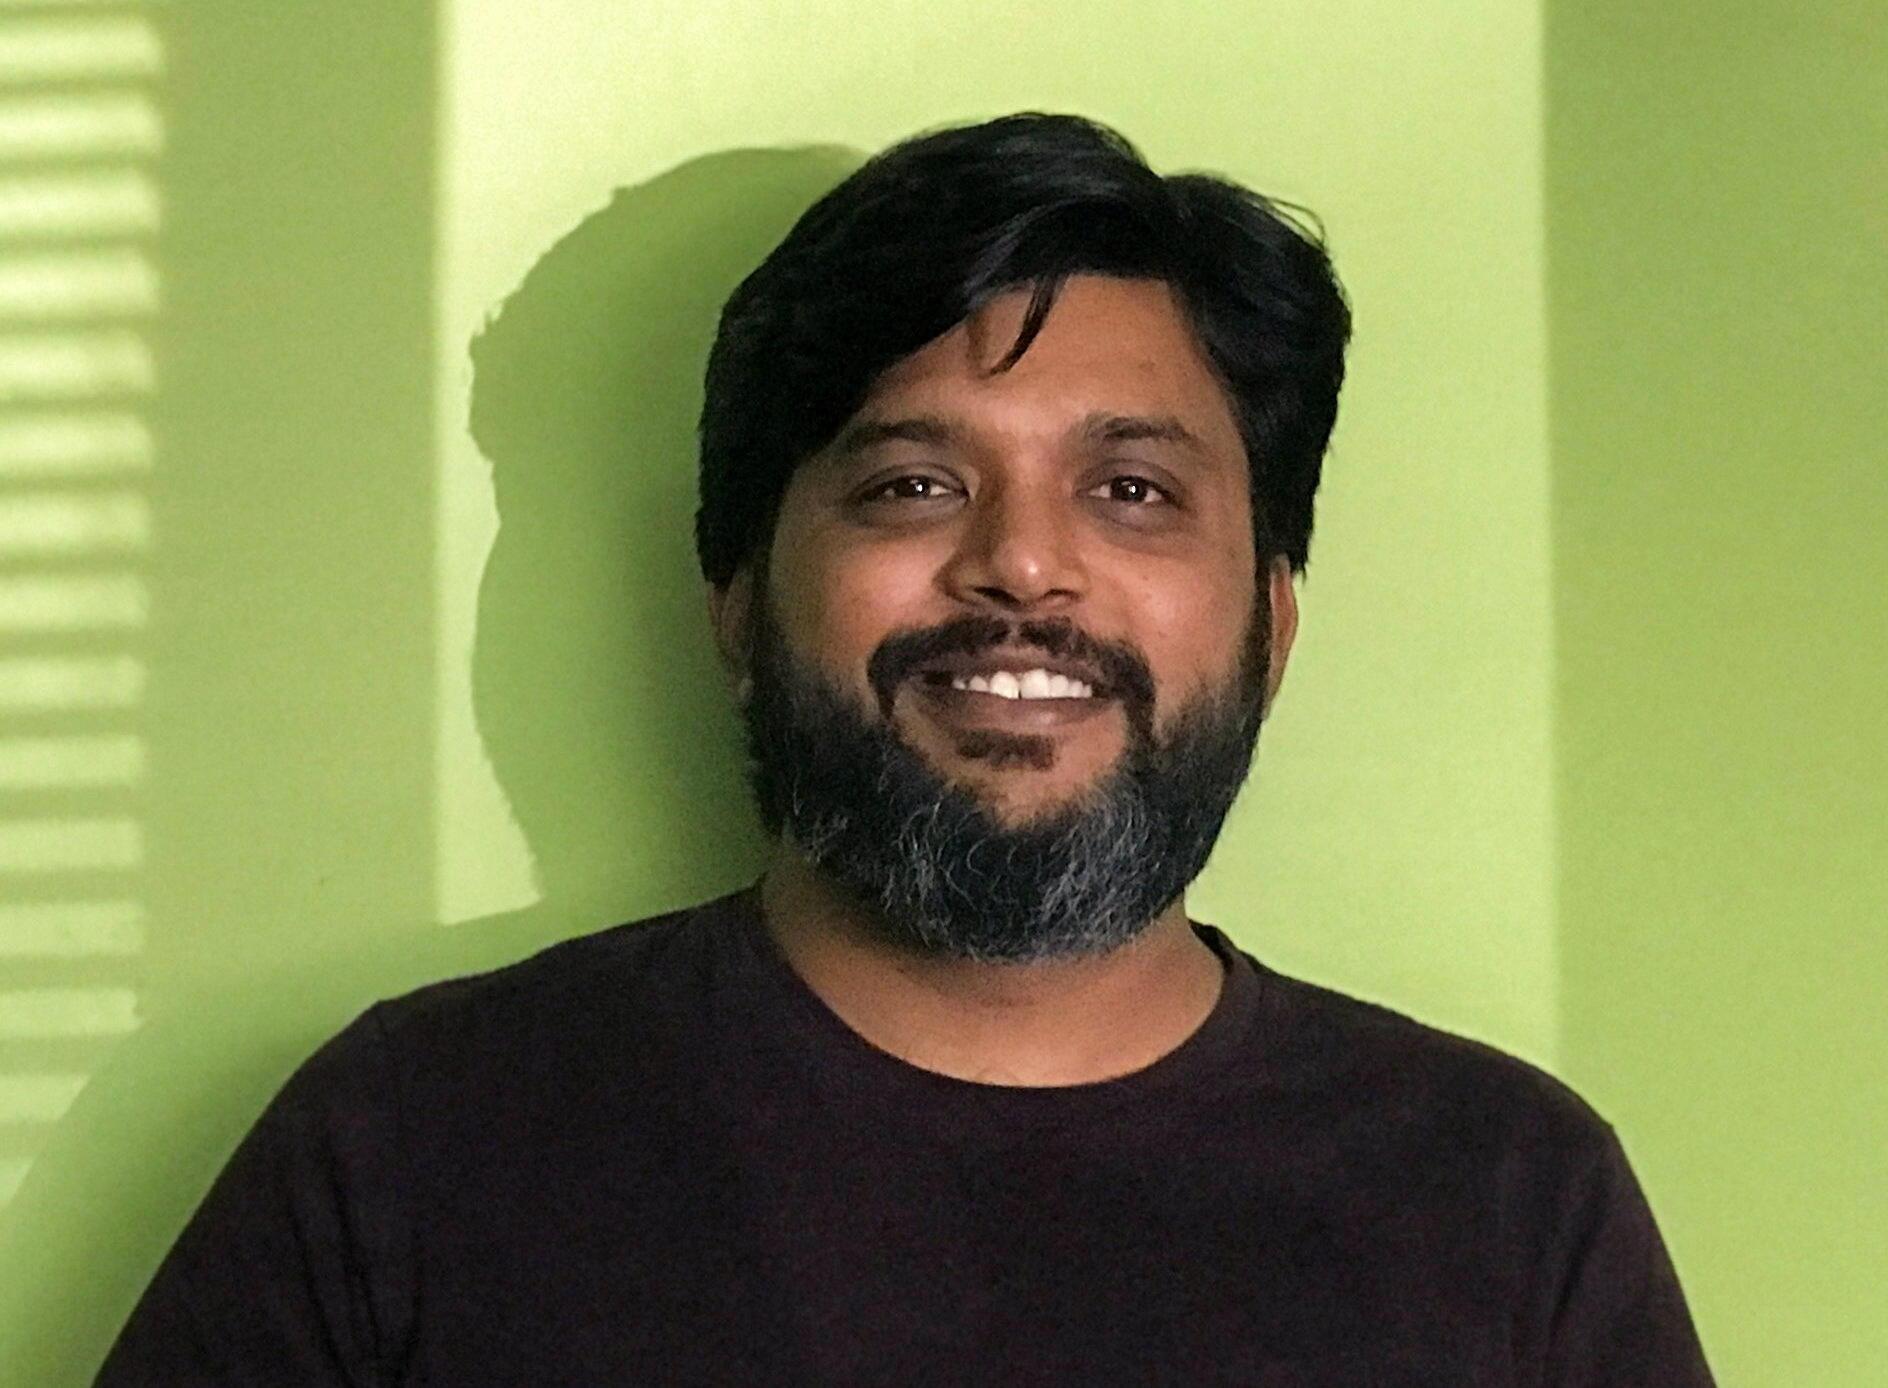 Le photographe indien Danish Siddiqui.